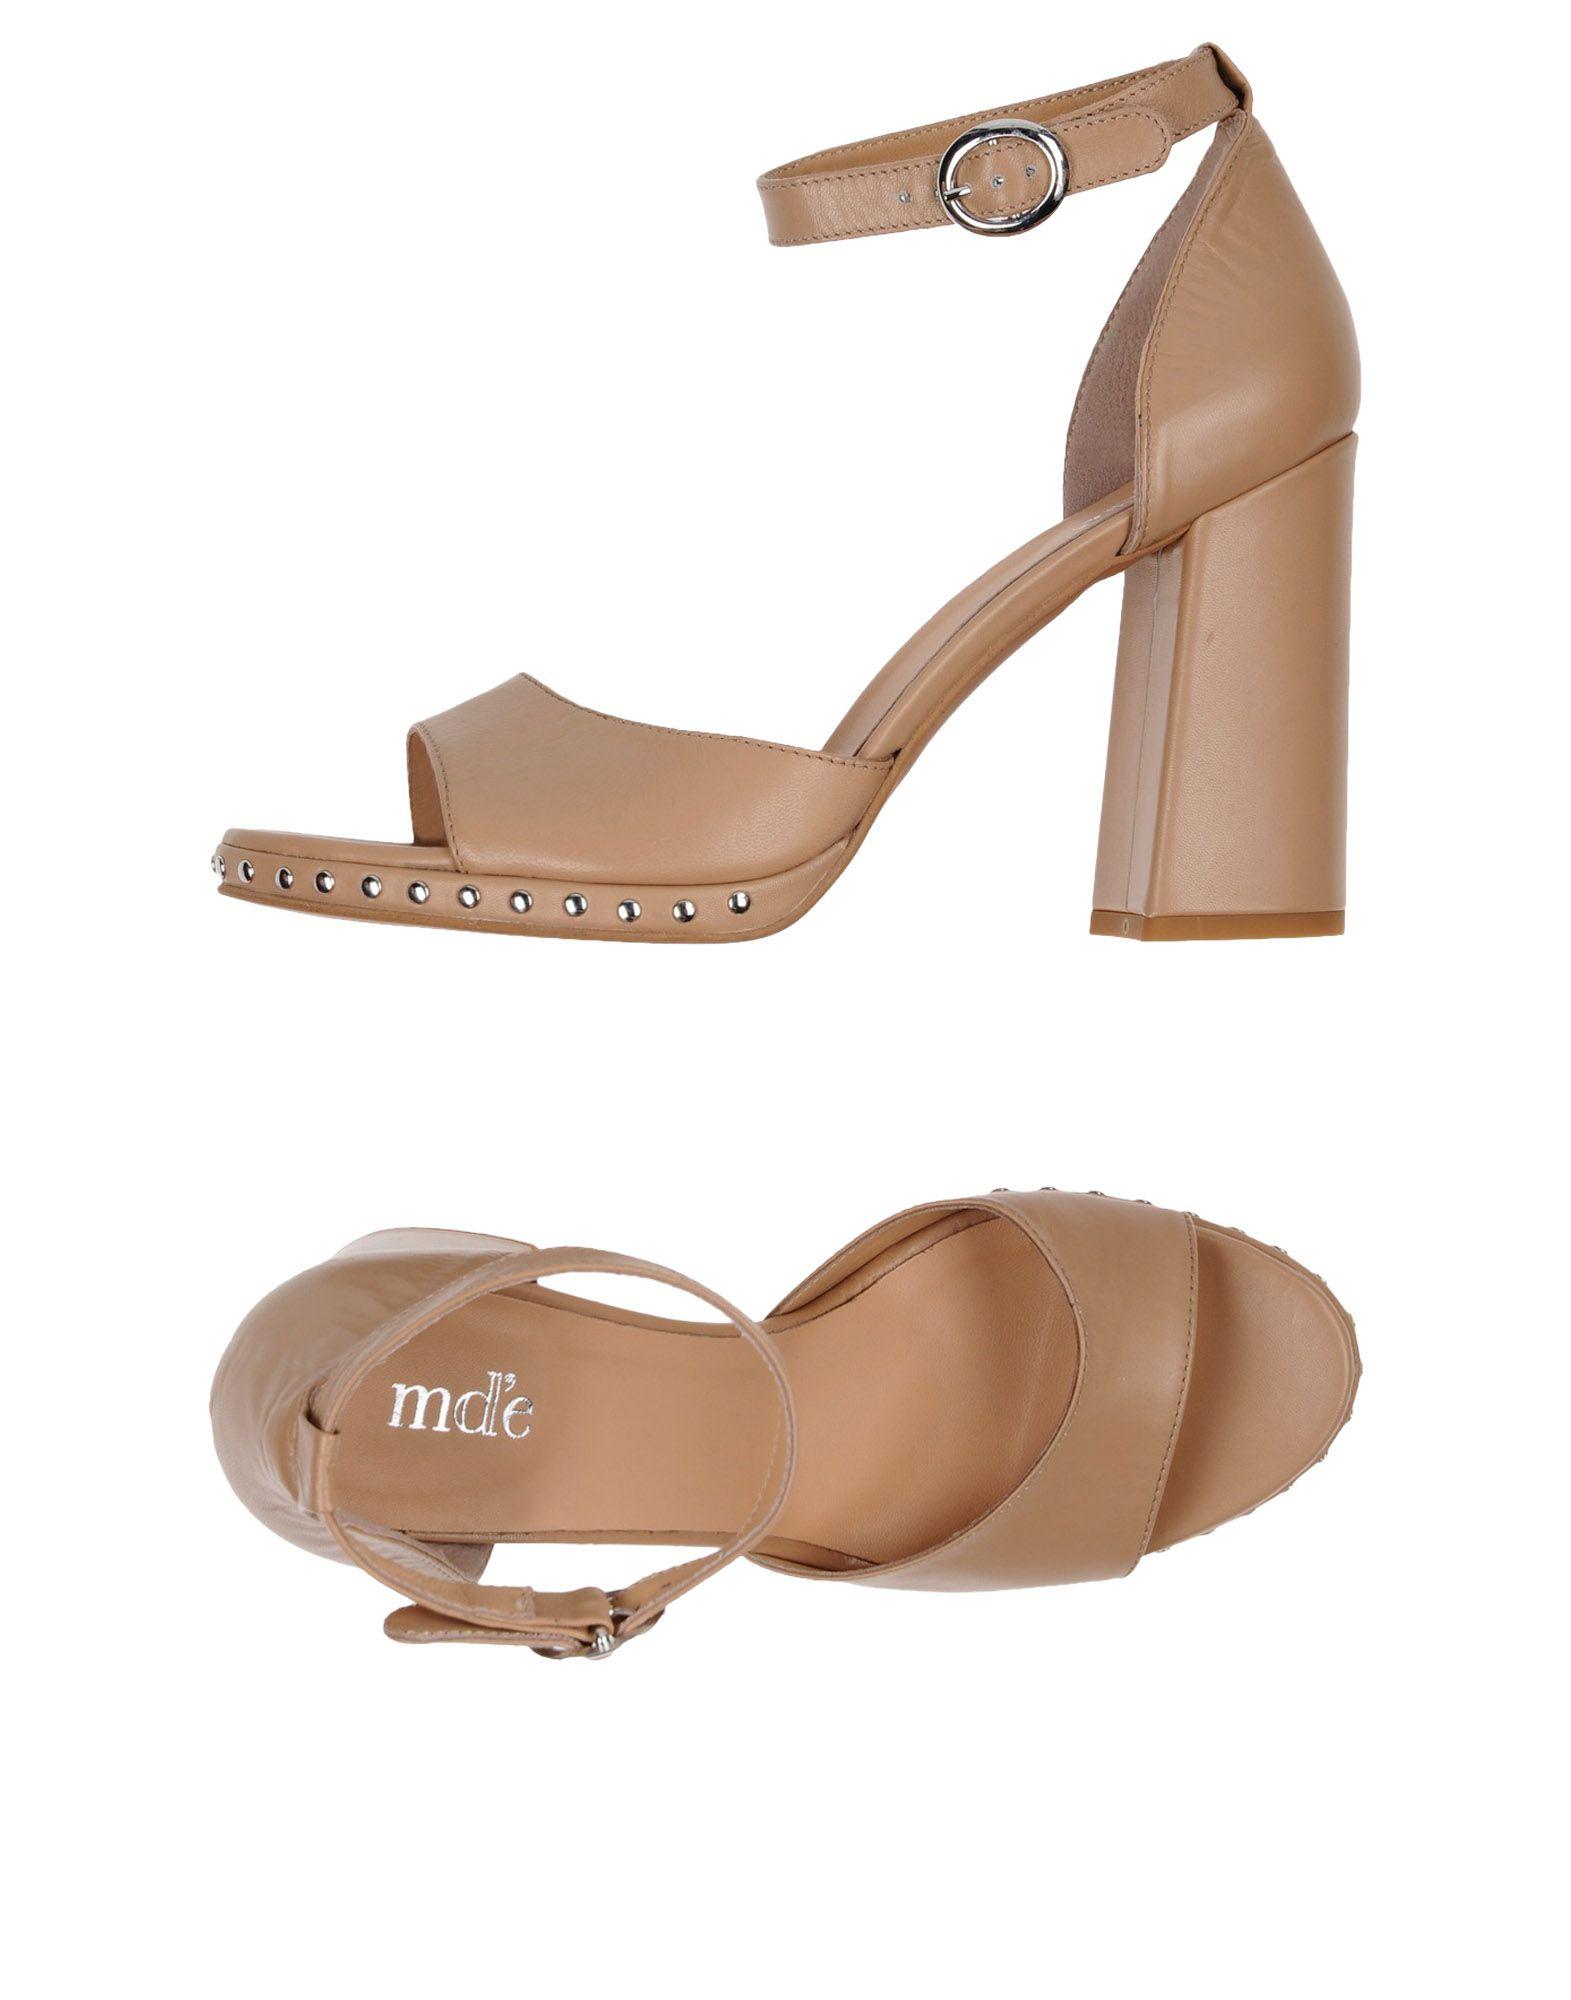 Manufacture D'essai Sandalen Damen  11424262XD Gute Qualität beliebte Schuhe